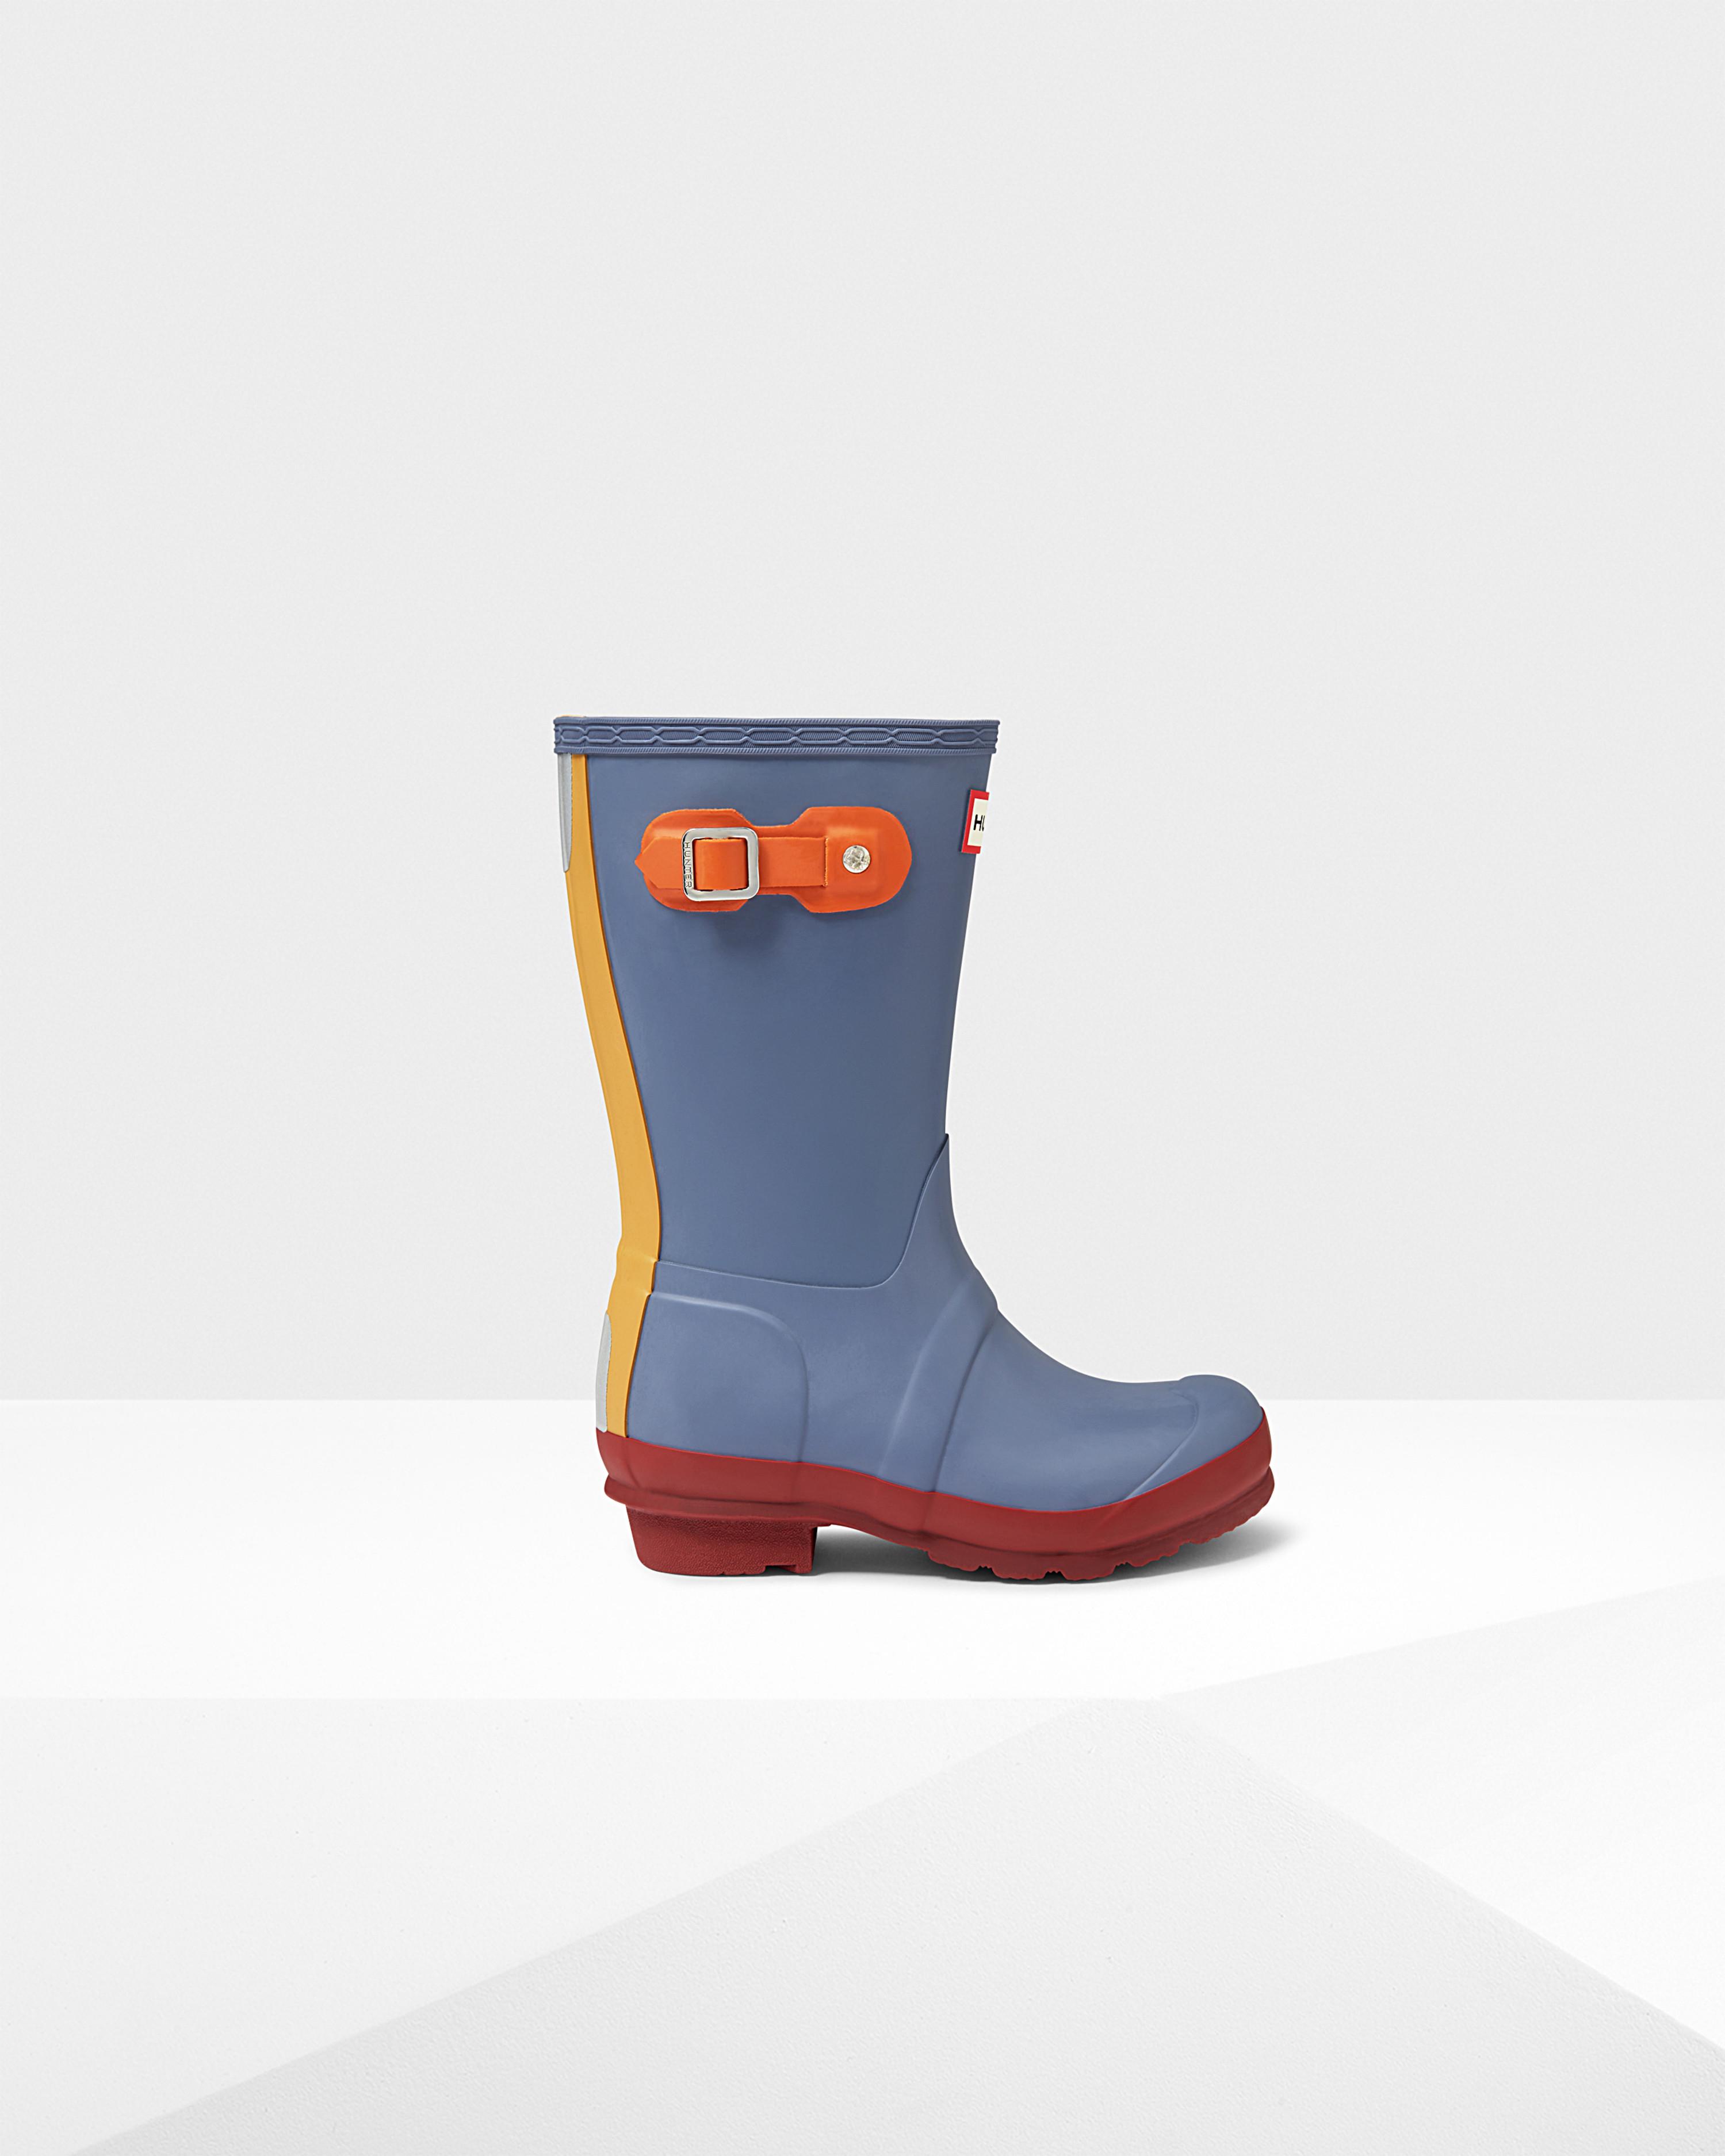 Lyst - Hunter Original Kids Contrast Sole Rain Boots In Blue